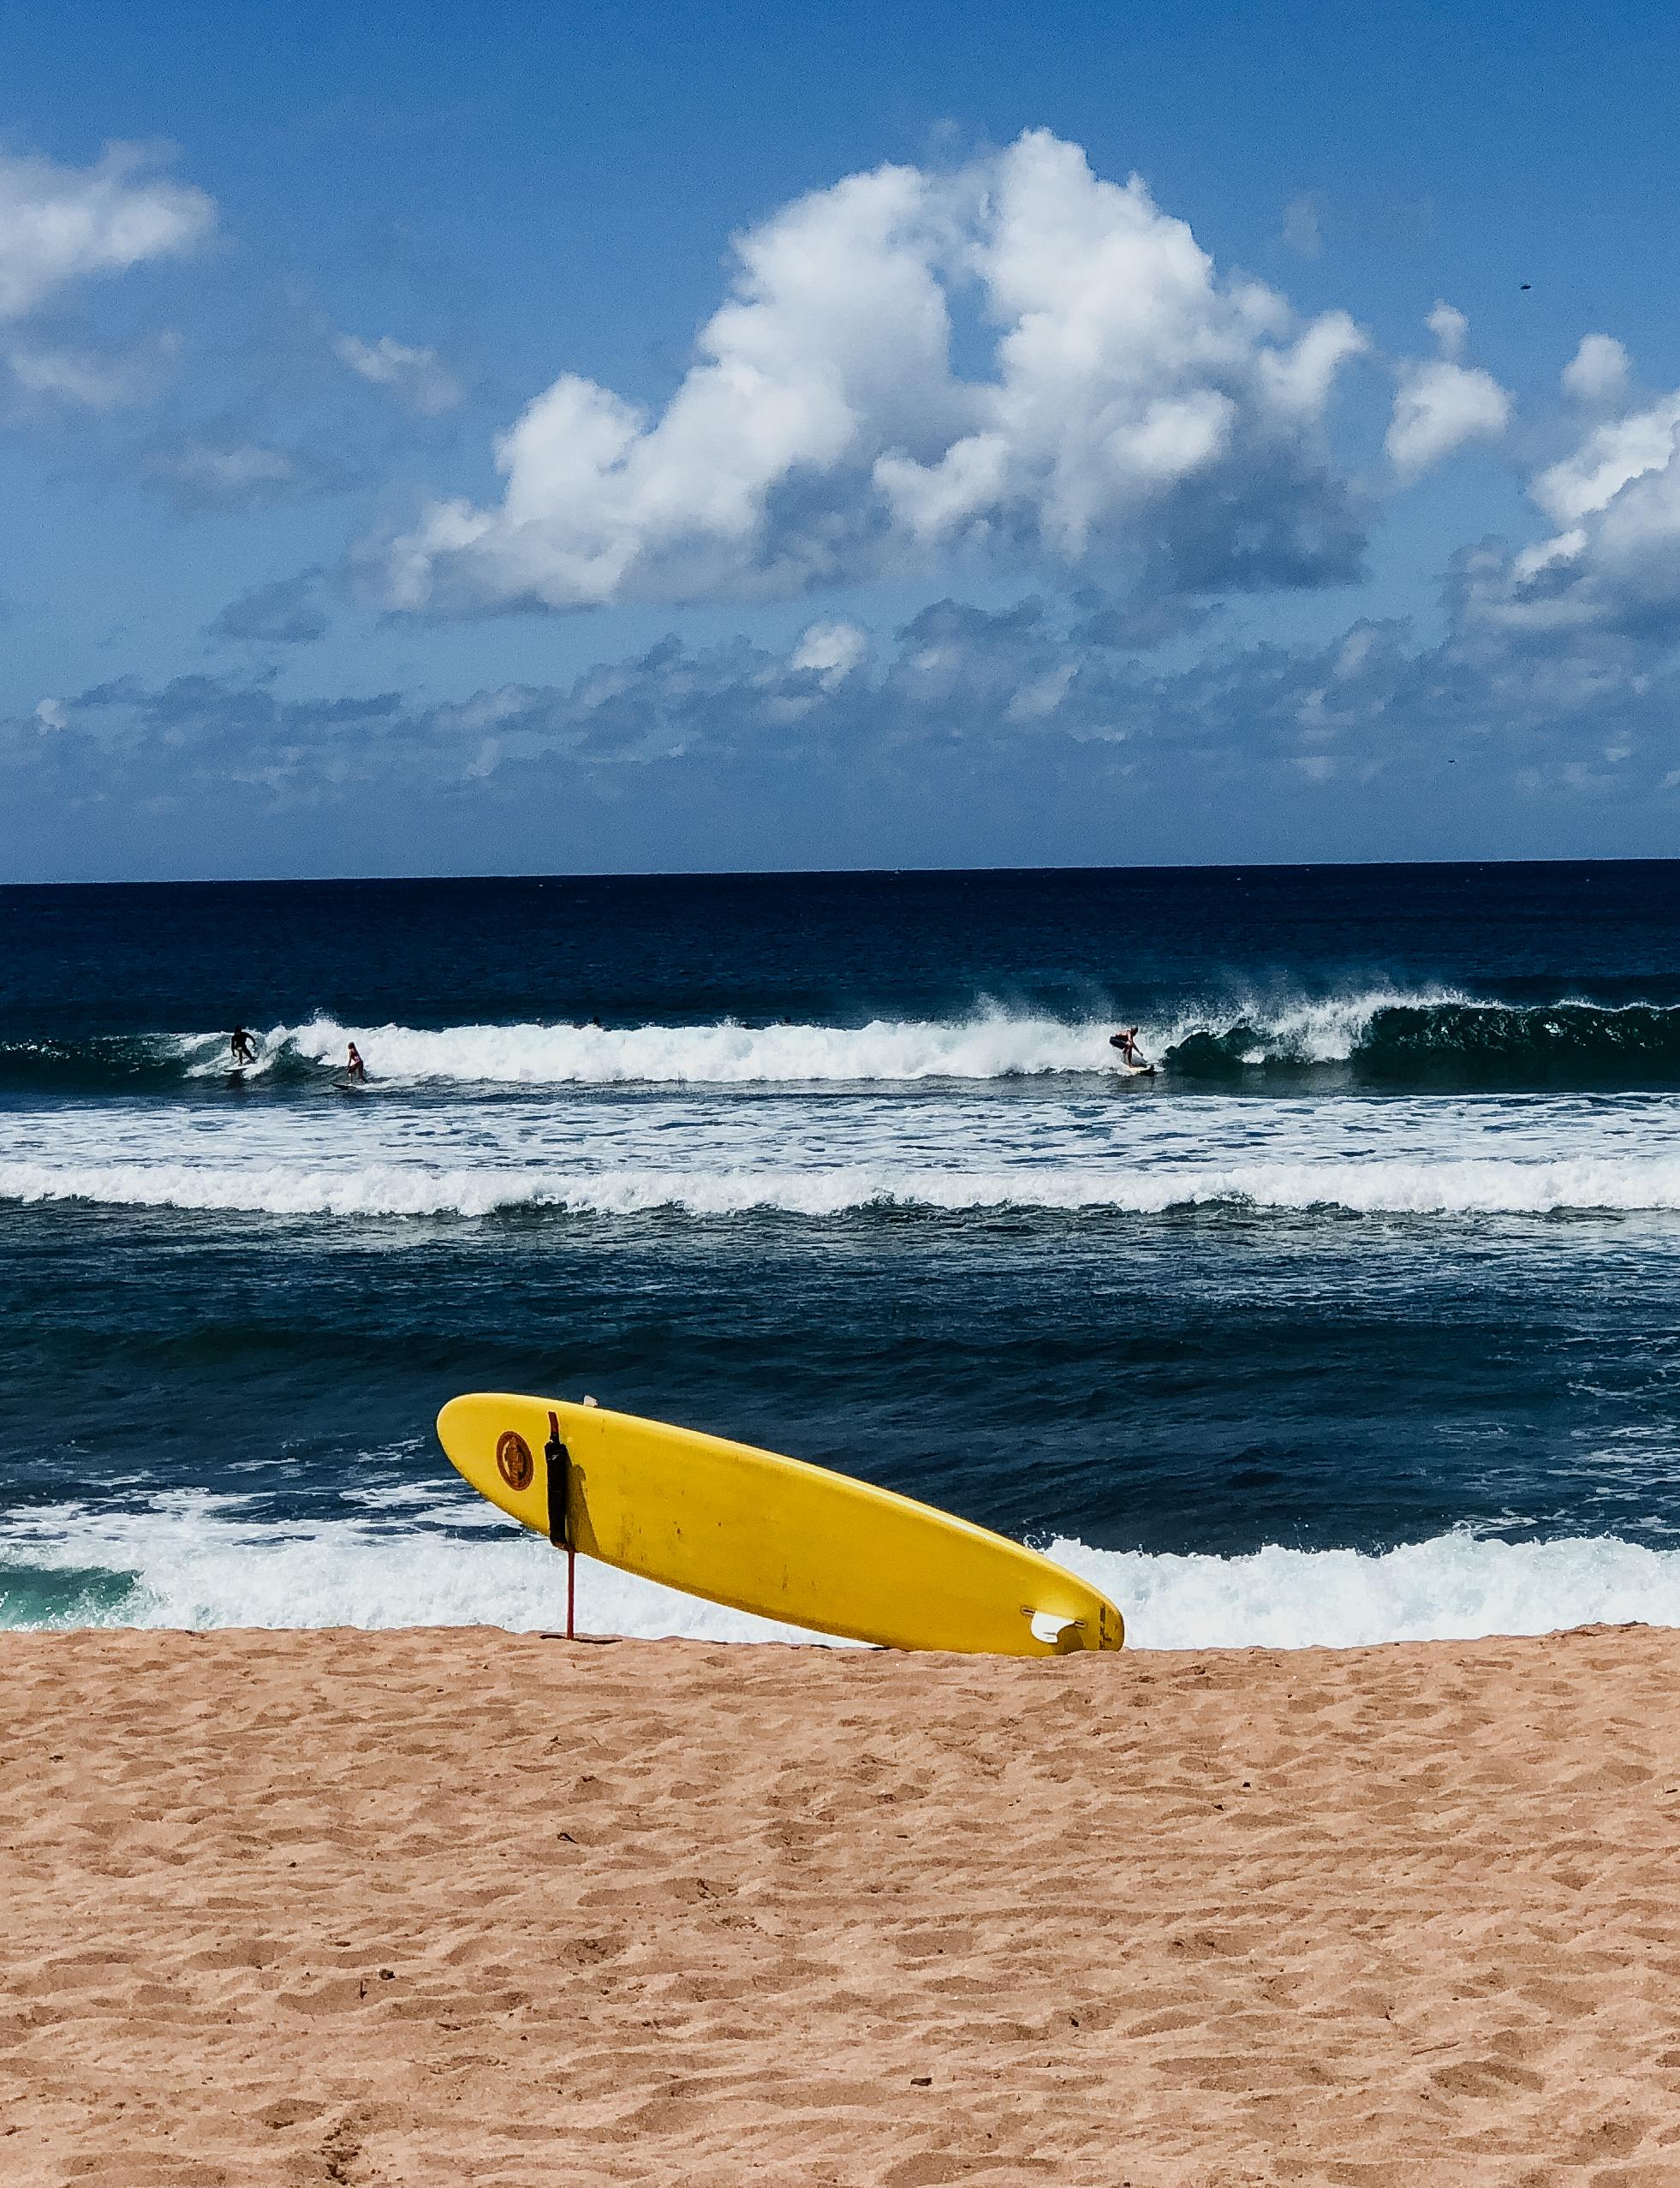 meagans hawaii pics-32.jpg